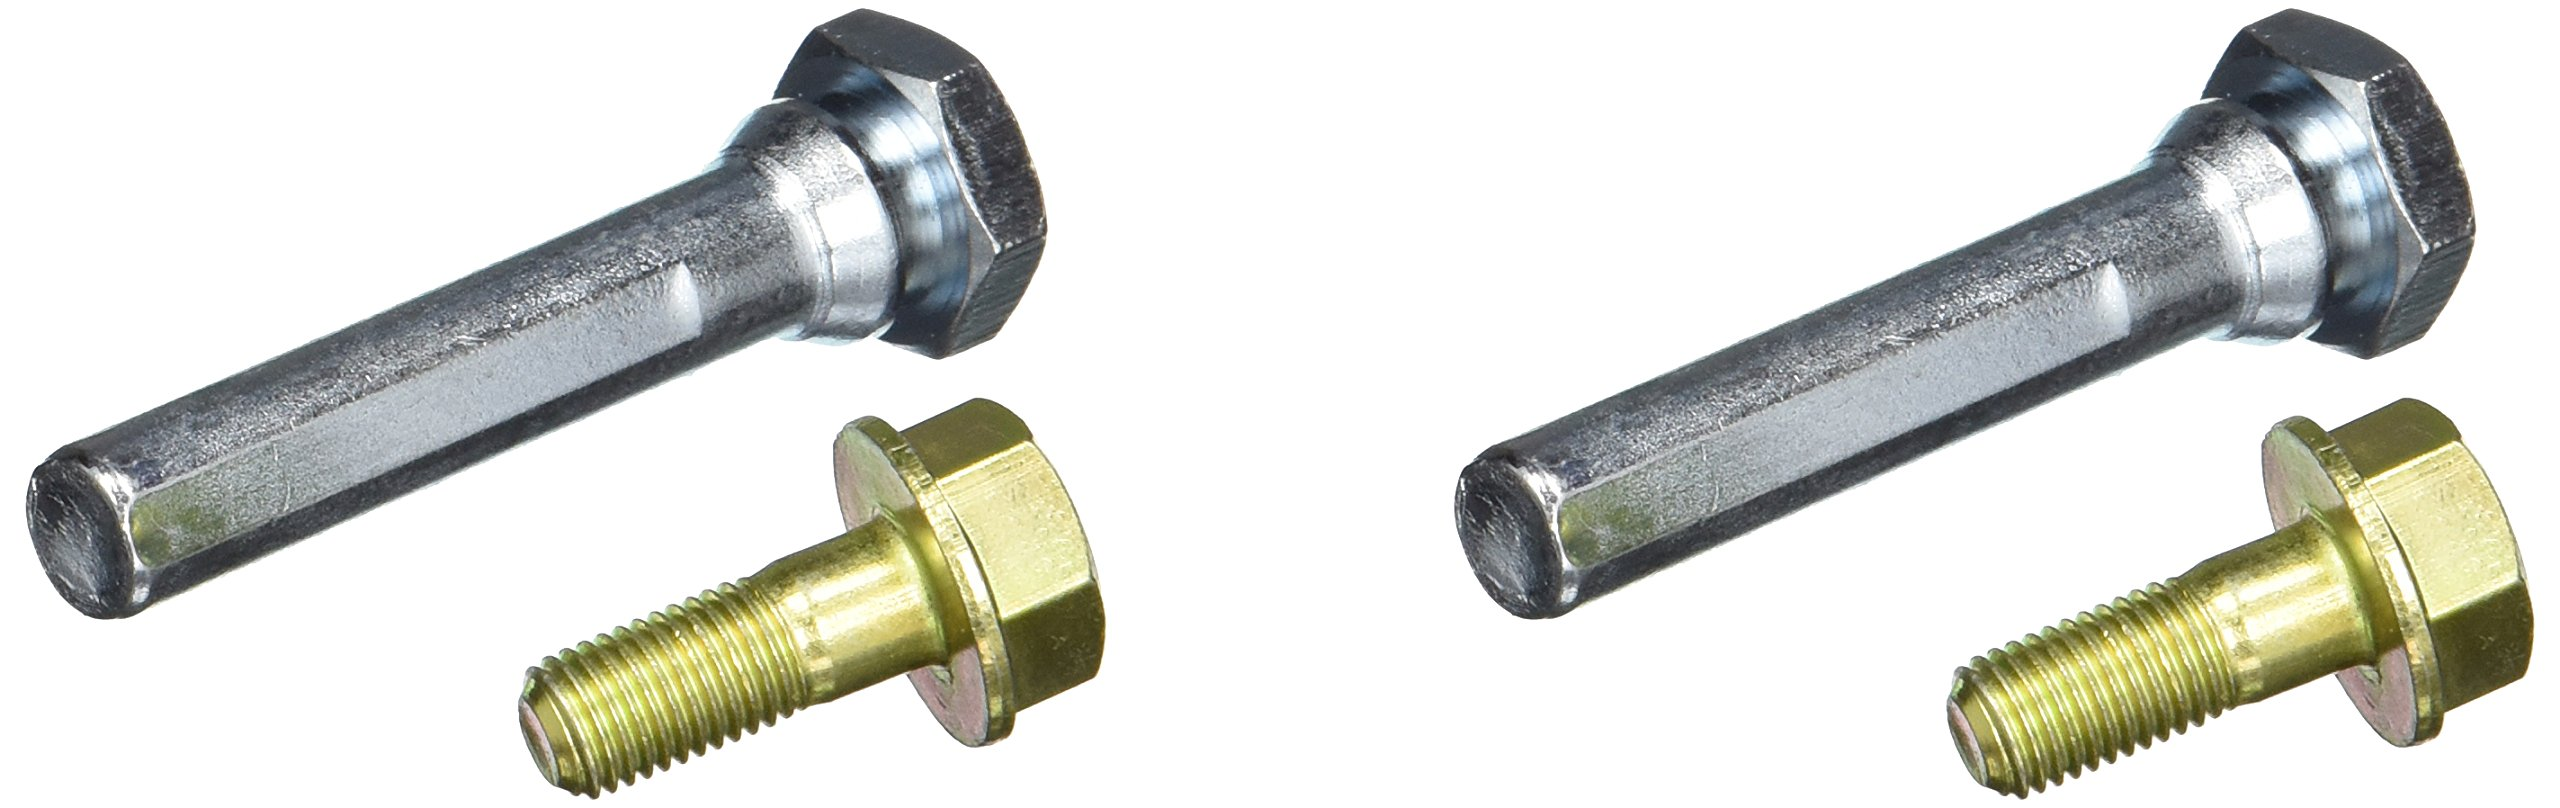 Disc Brake Caliper Guide Pin Front,Rear Carlson 14137